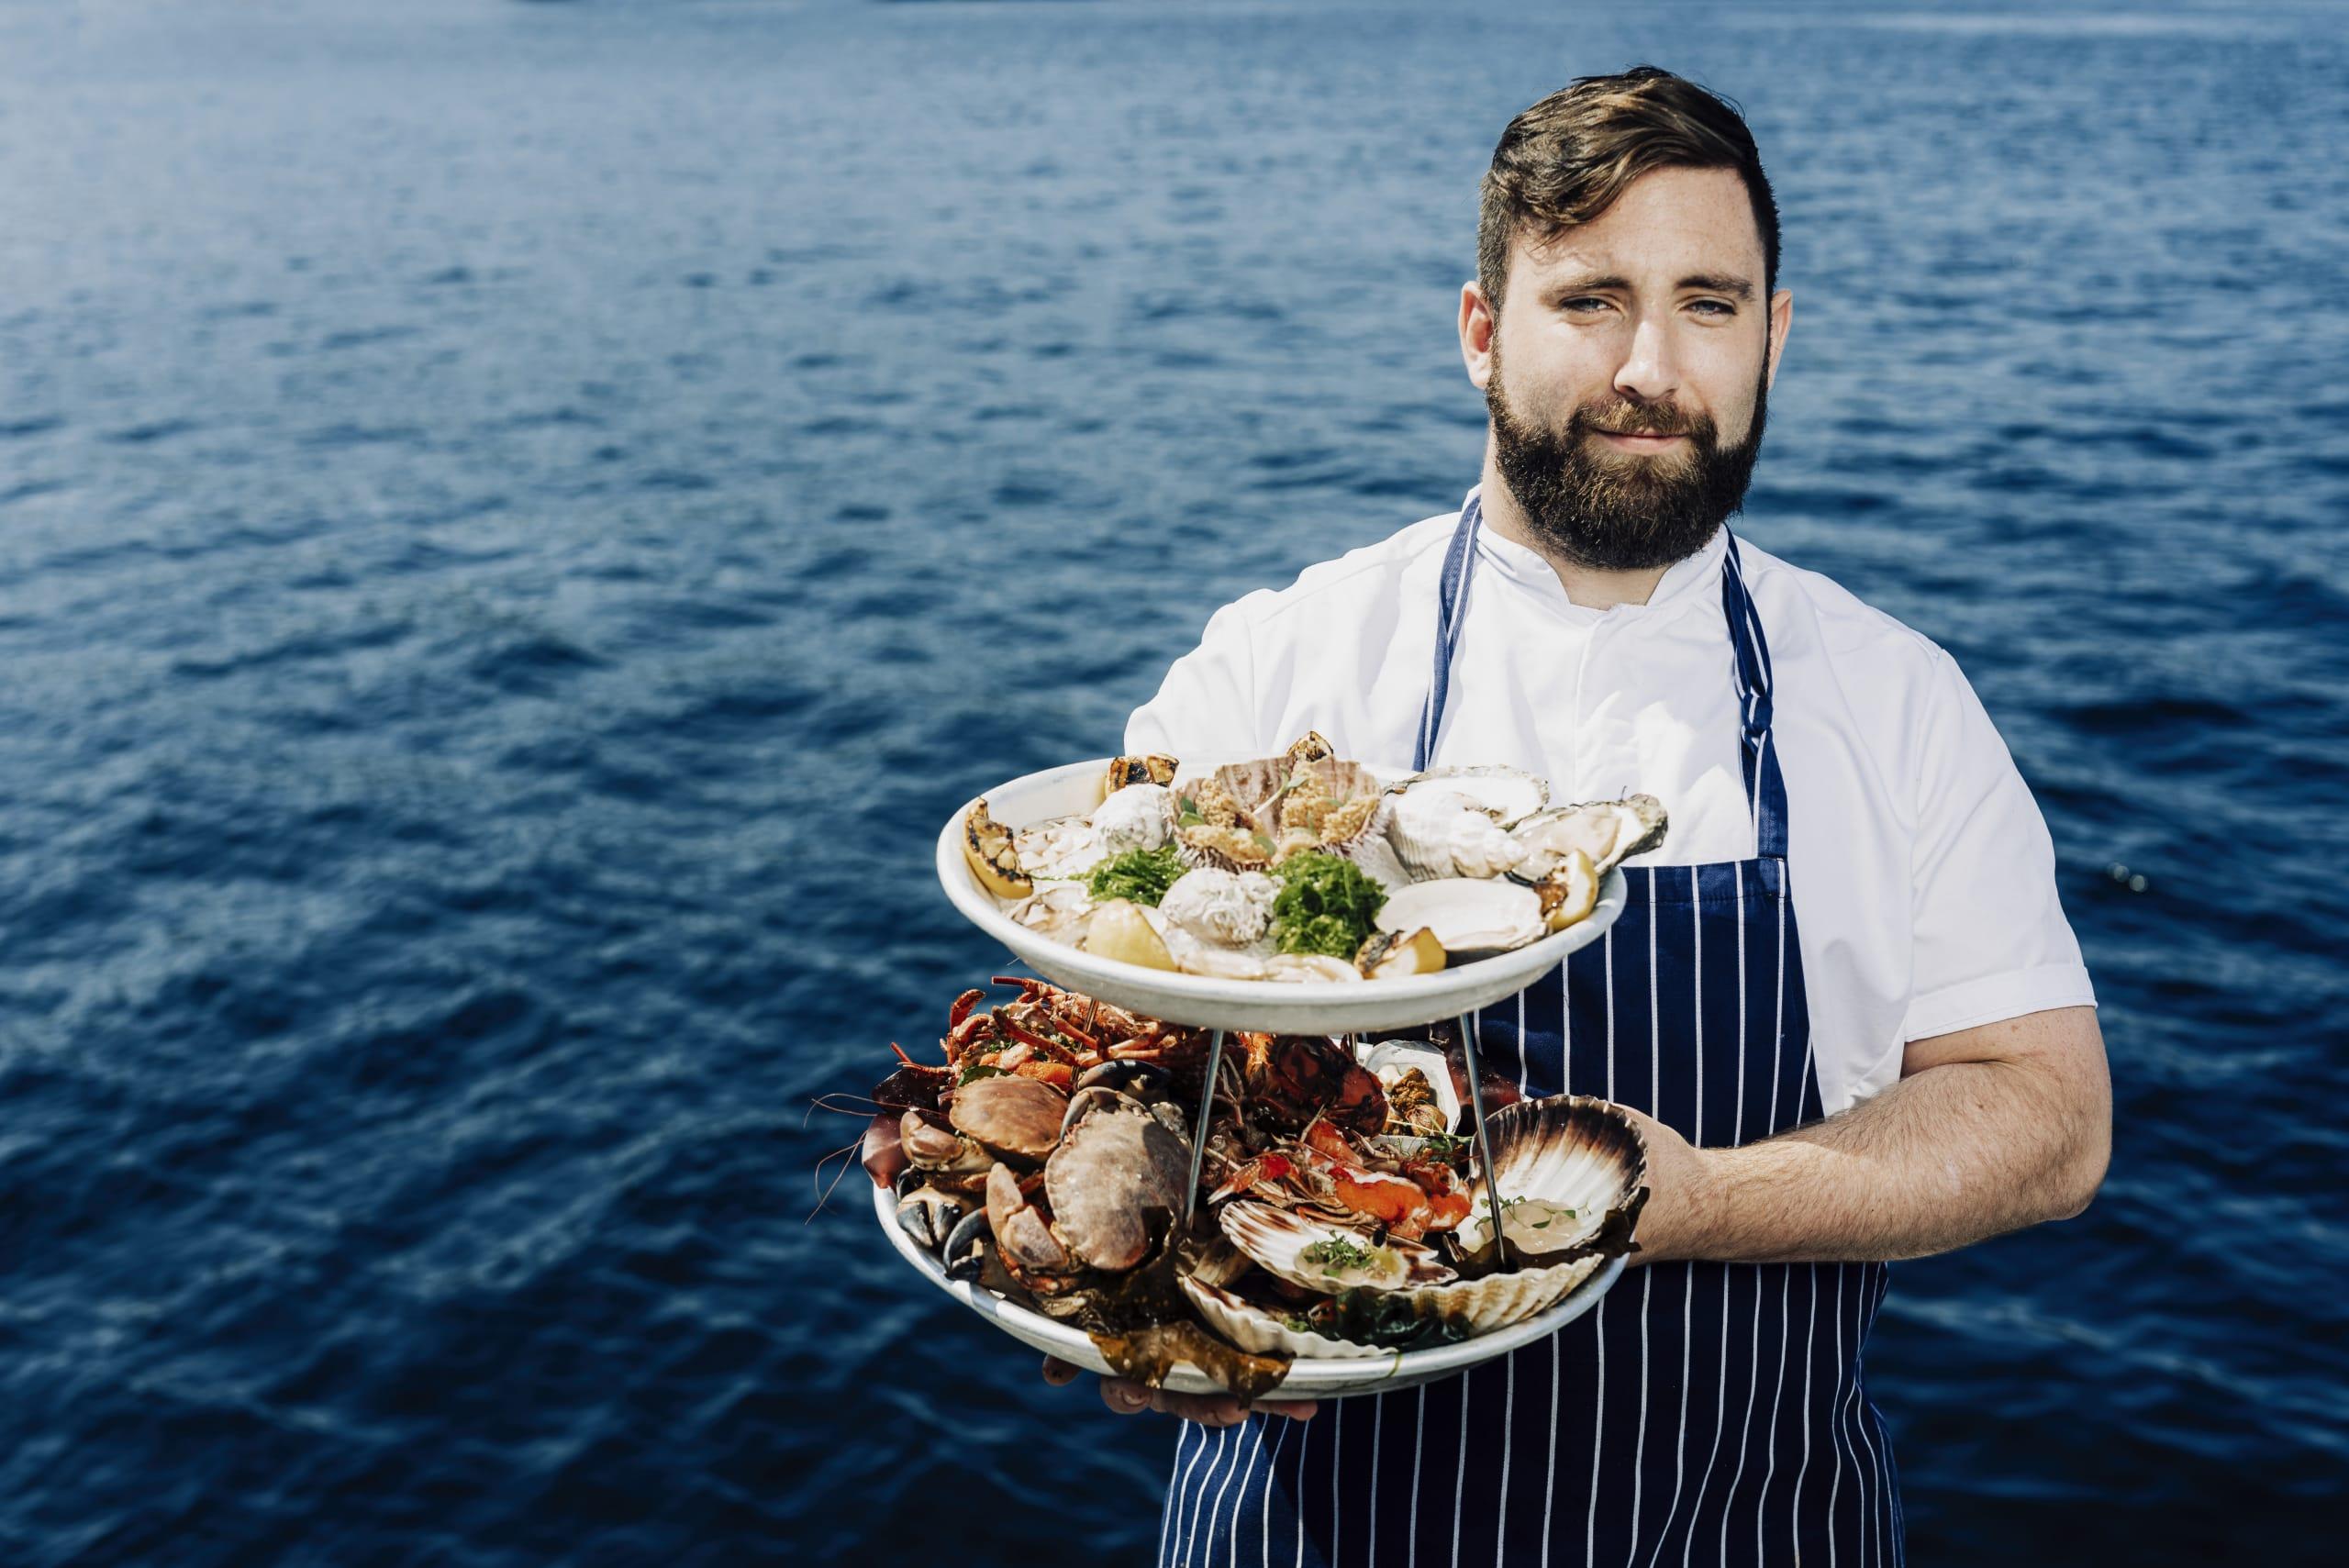 Chef presenting shellfish tower